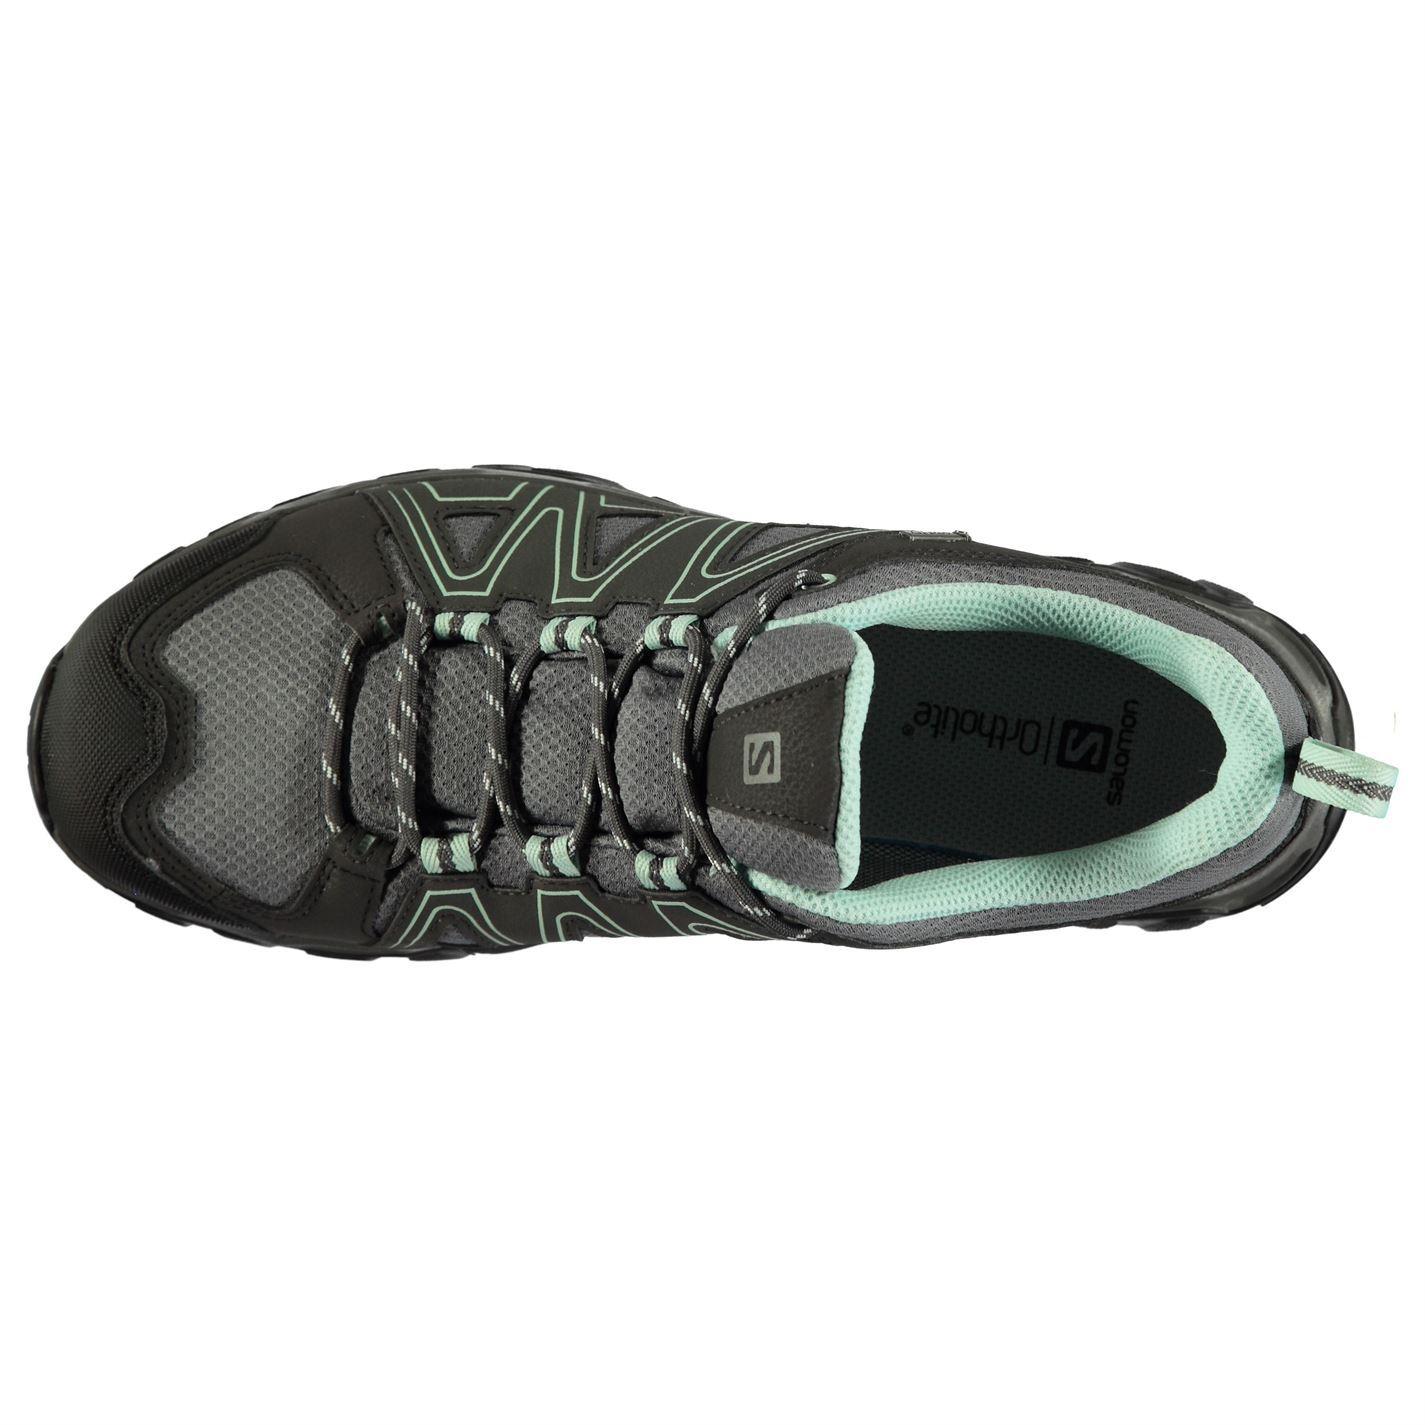 Salomon Sandford Womens Walking Shoes